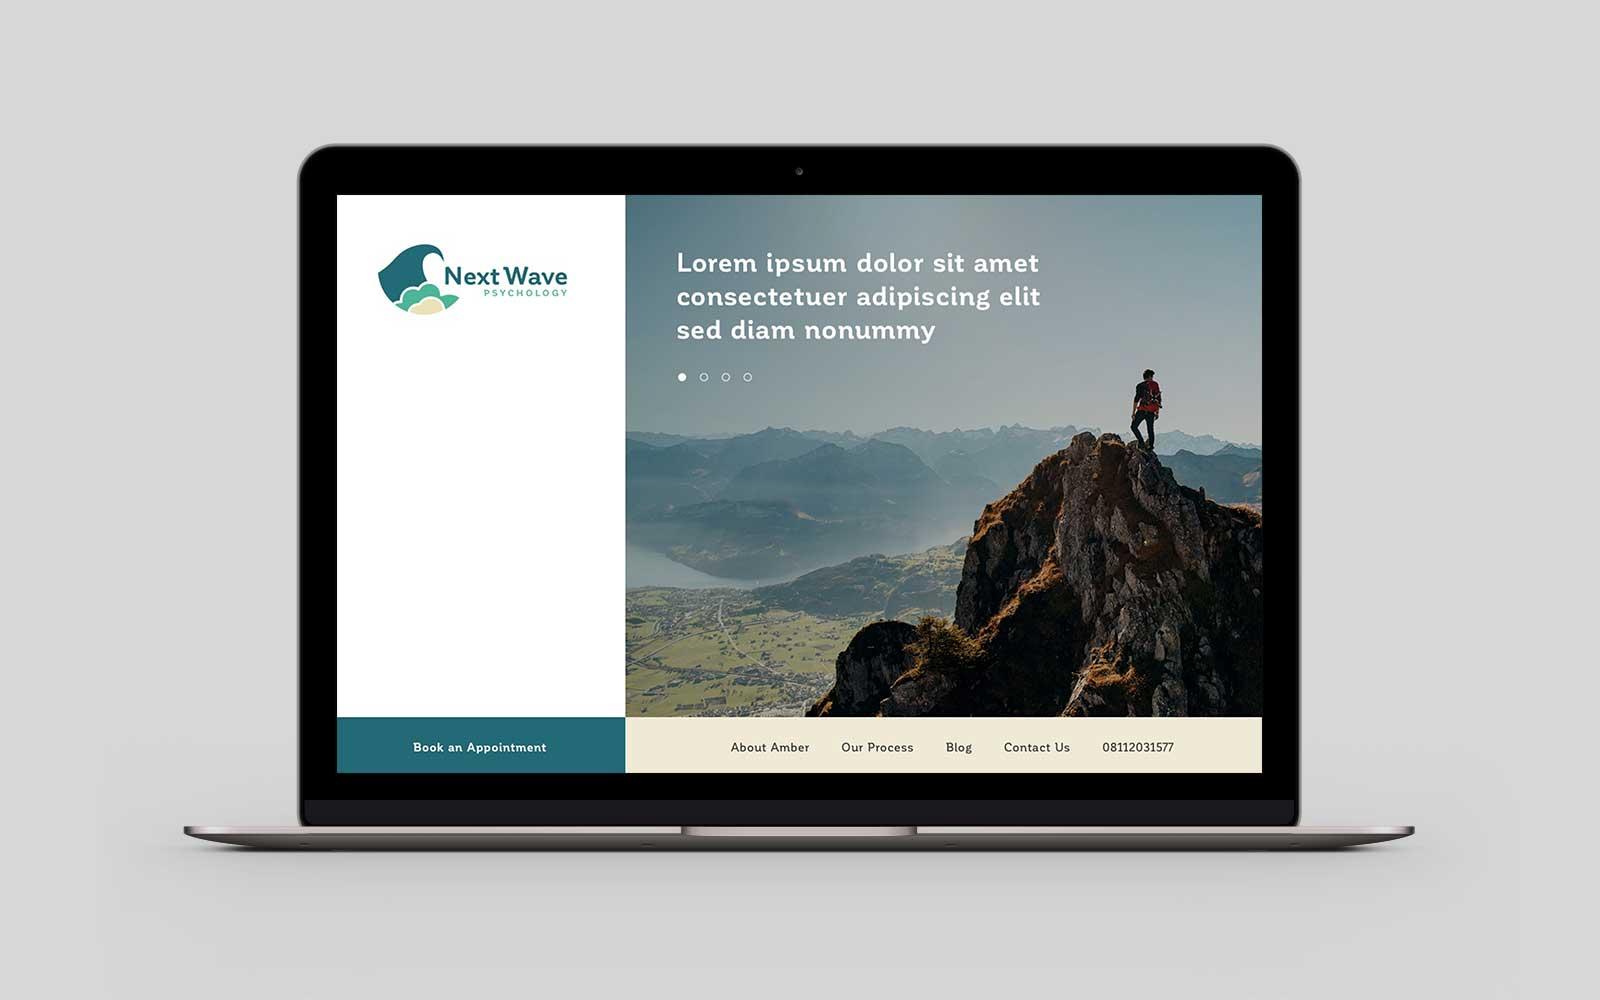 Next Wave Psychology homepage desktop design on Macbook